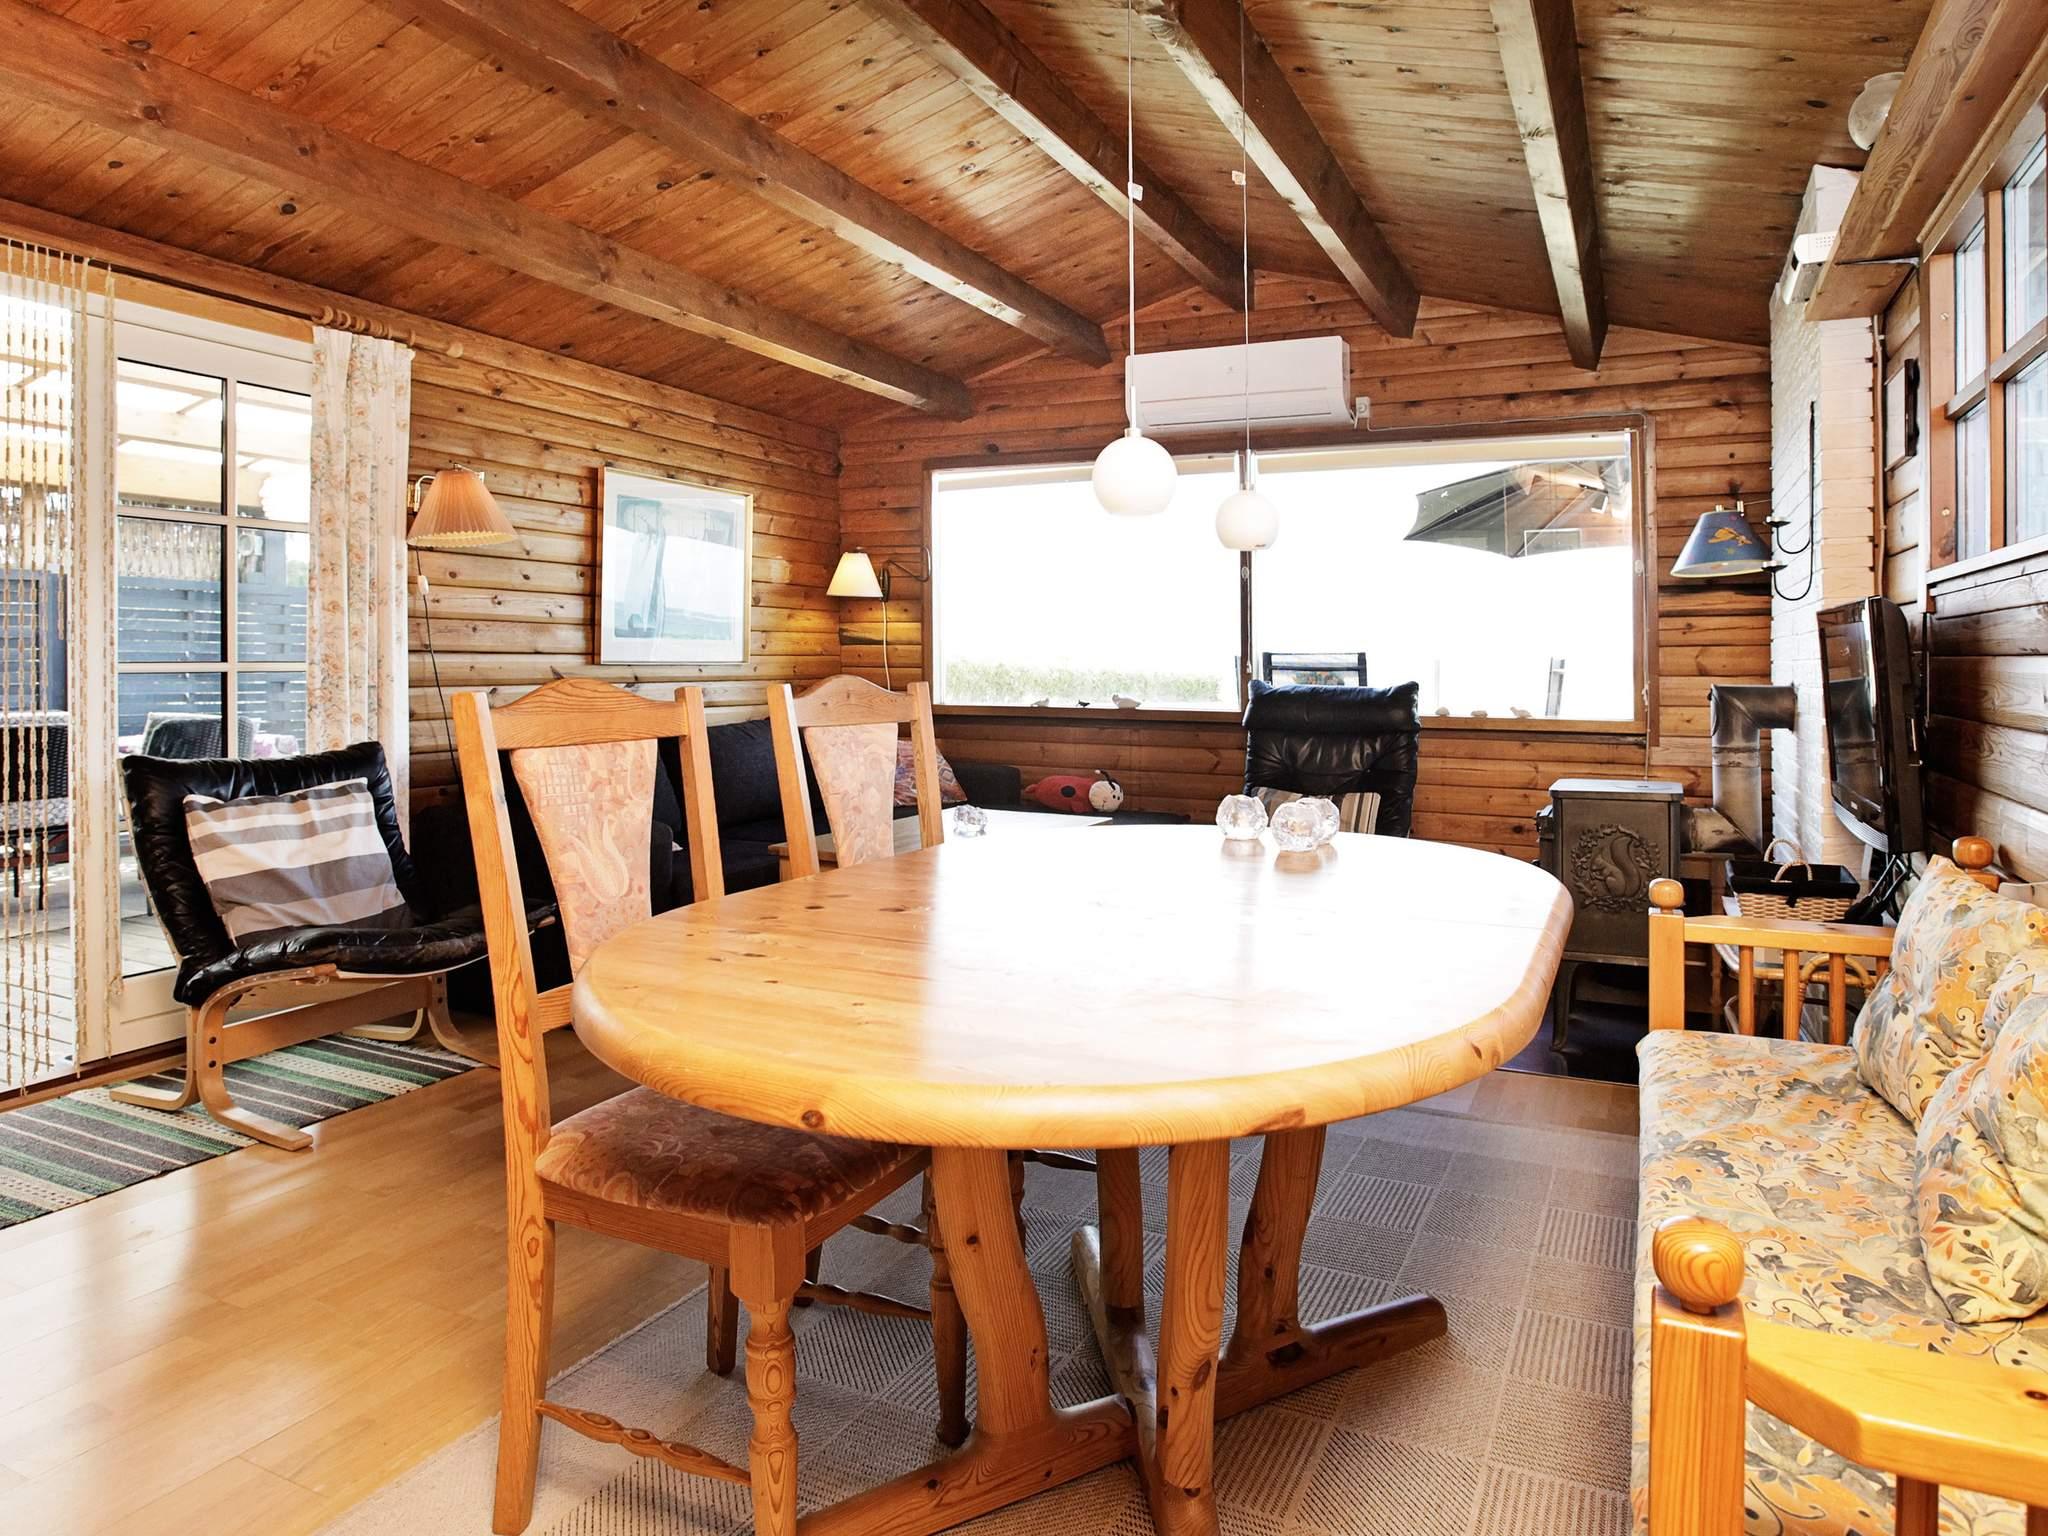 Maison de vacances Hesseløje/Fruerlund (87495), Faaborg, , Fionie, Danemark, image 4